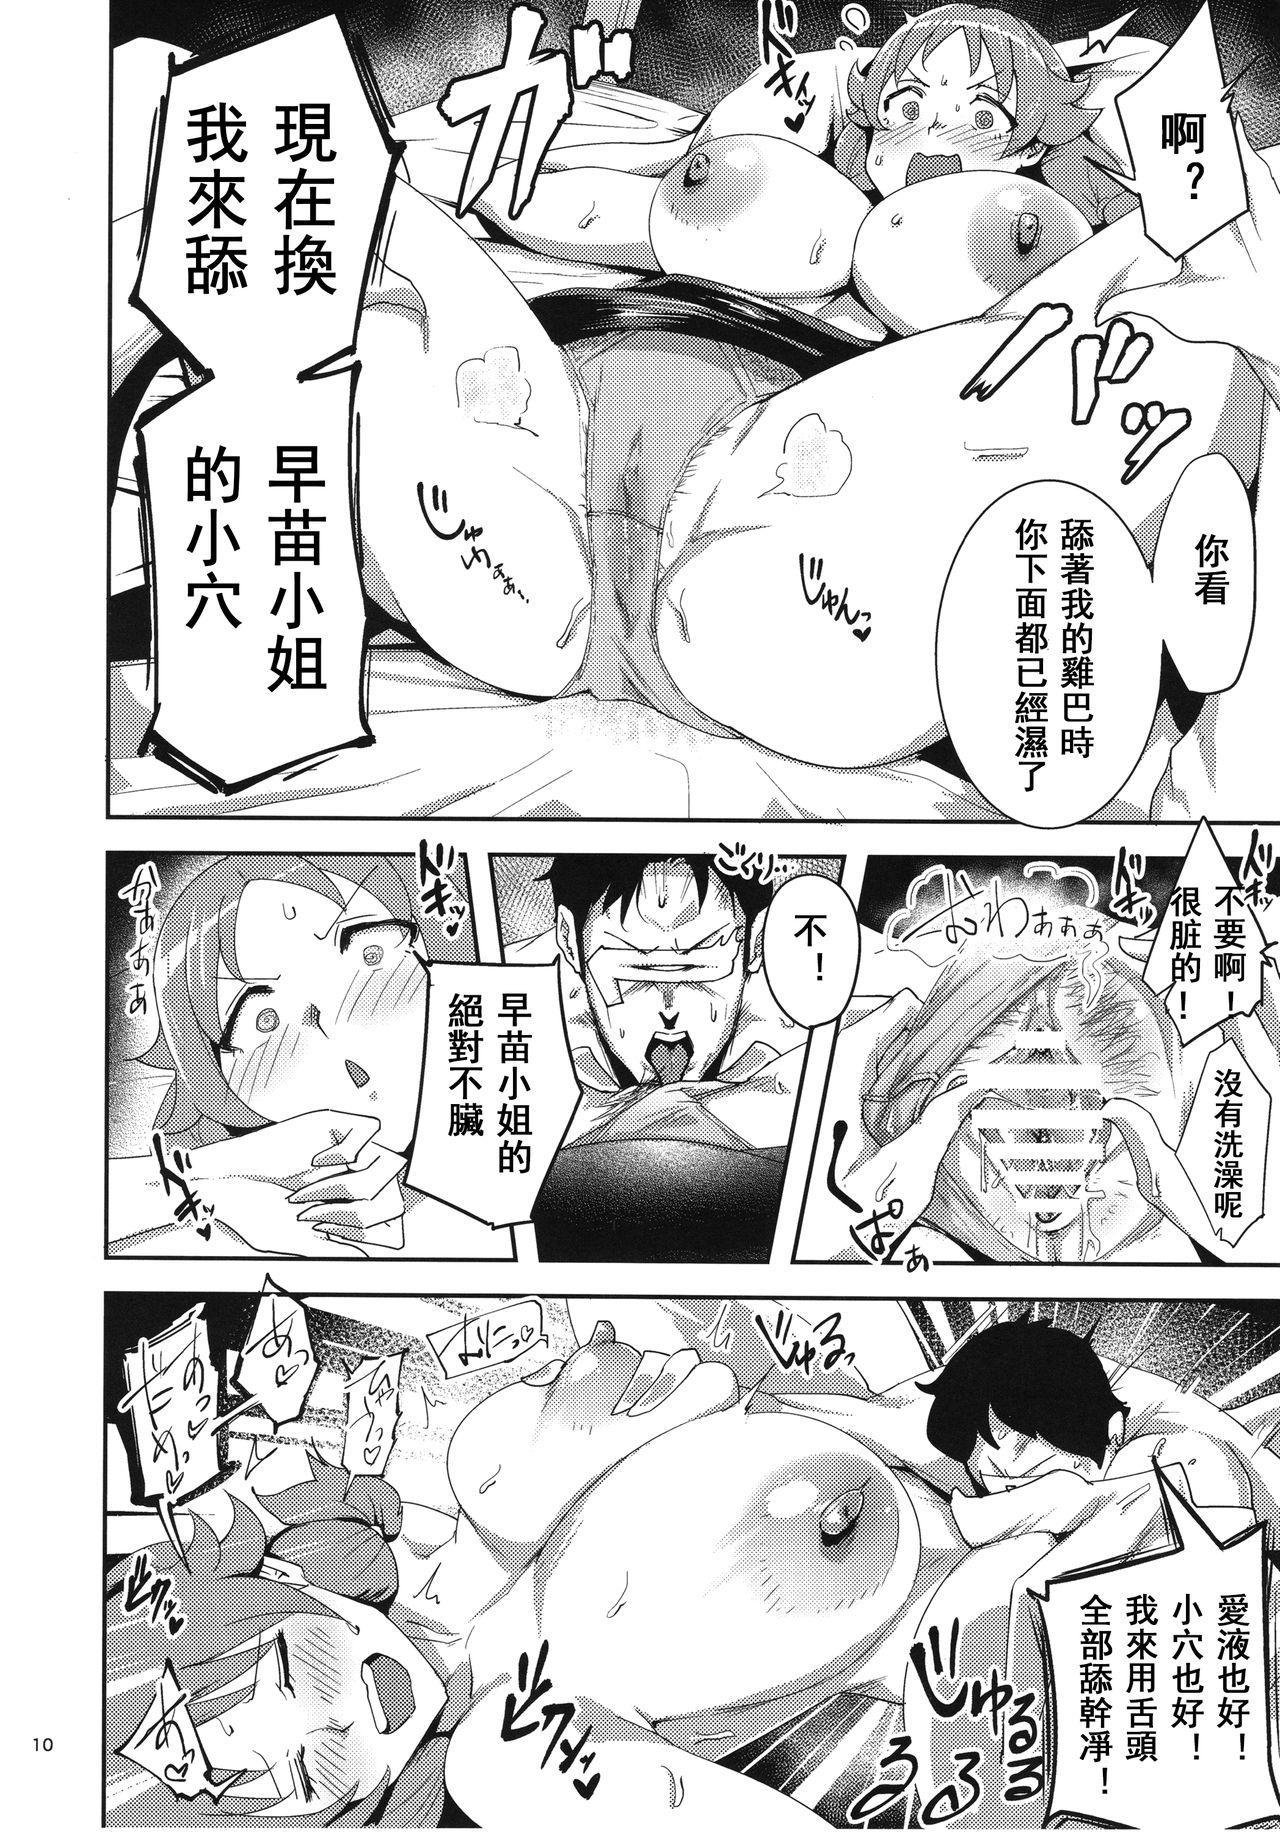 Sanae-san ni Genki ni Shitemorau Hon 9